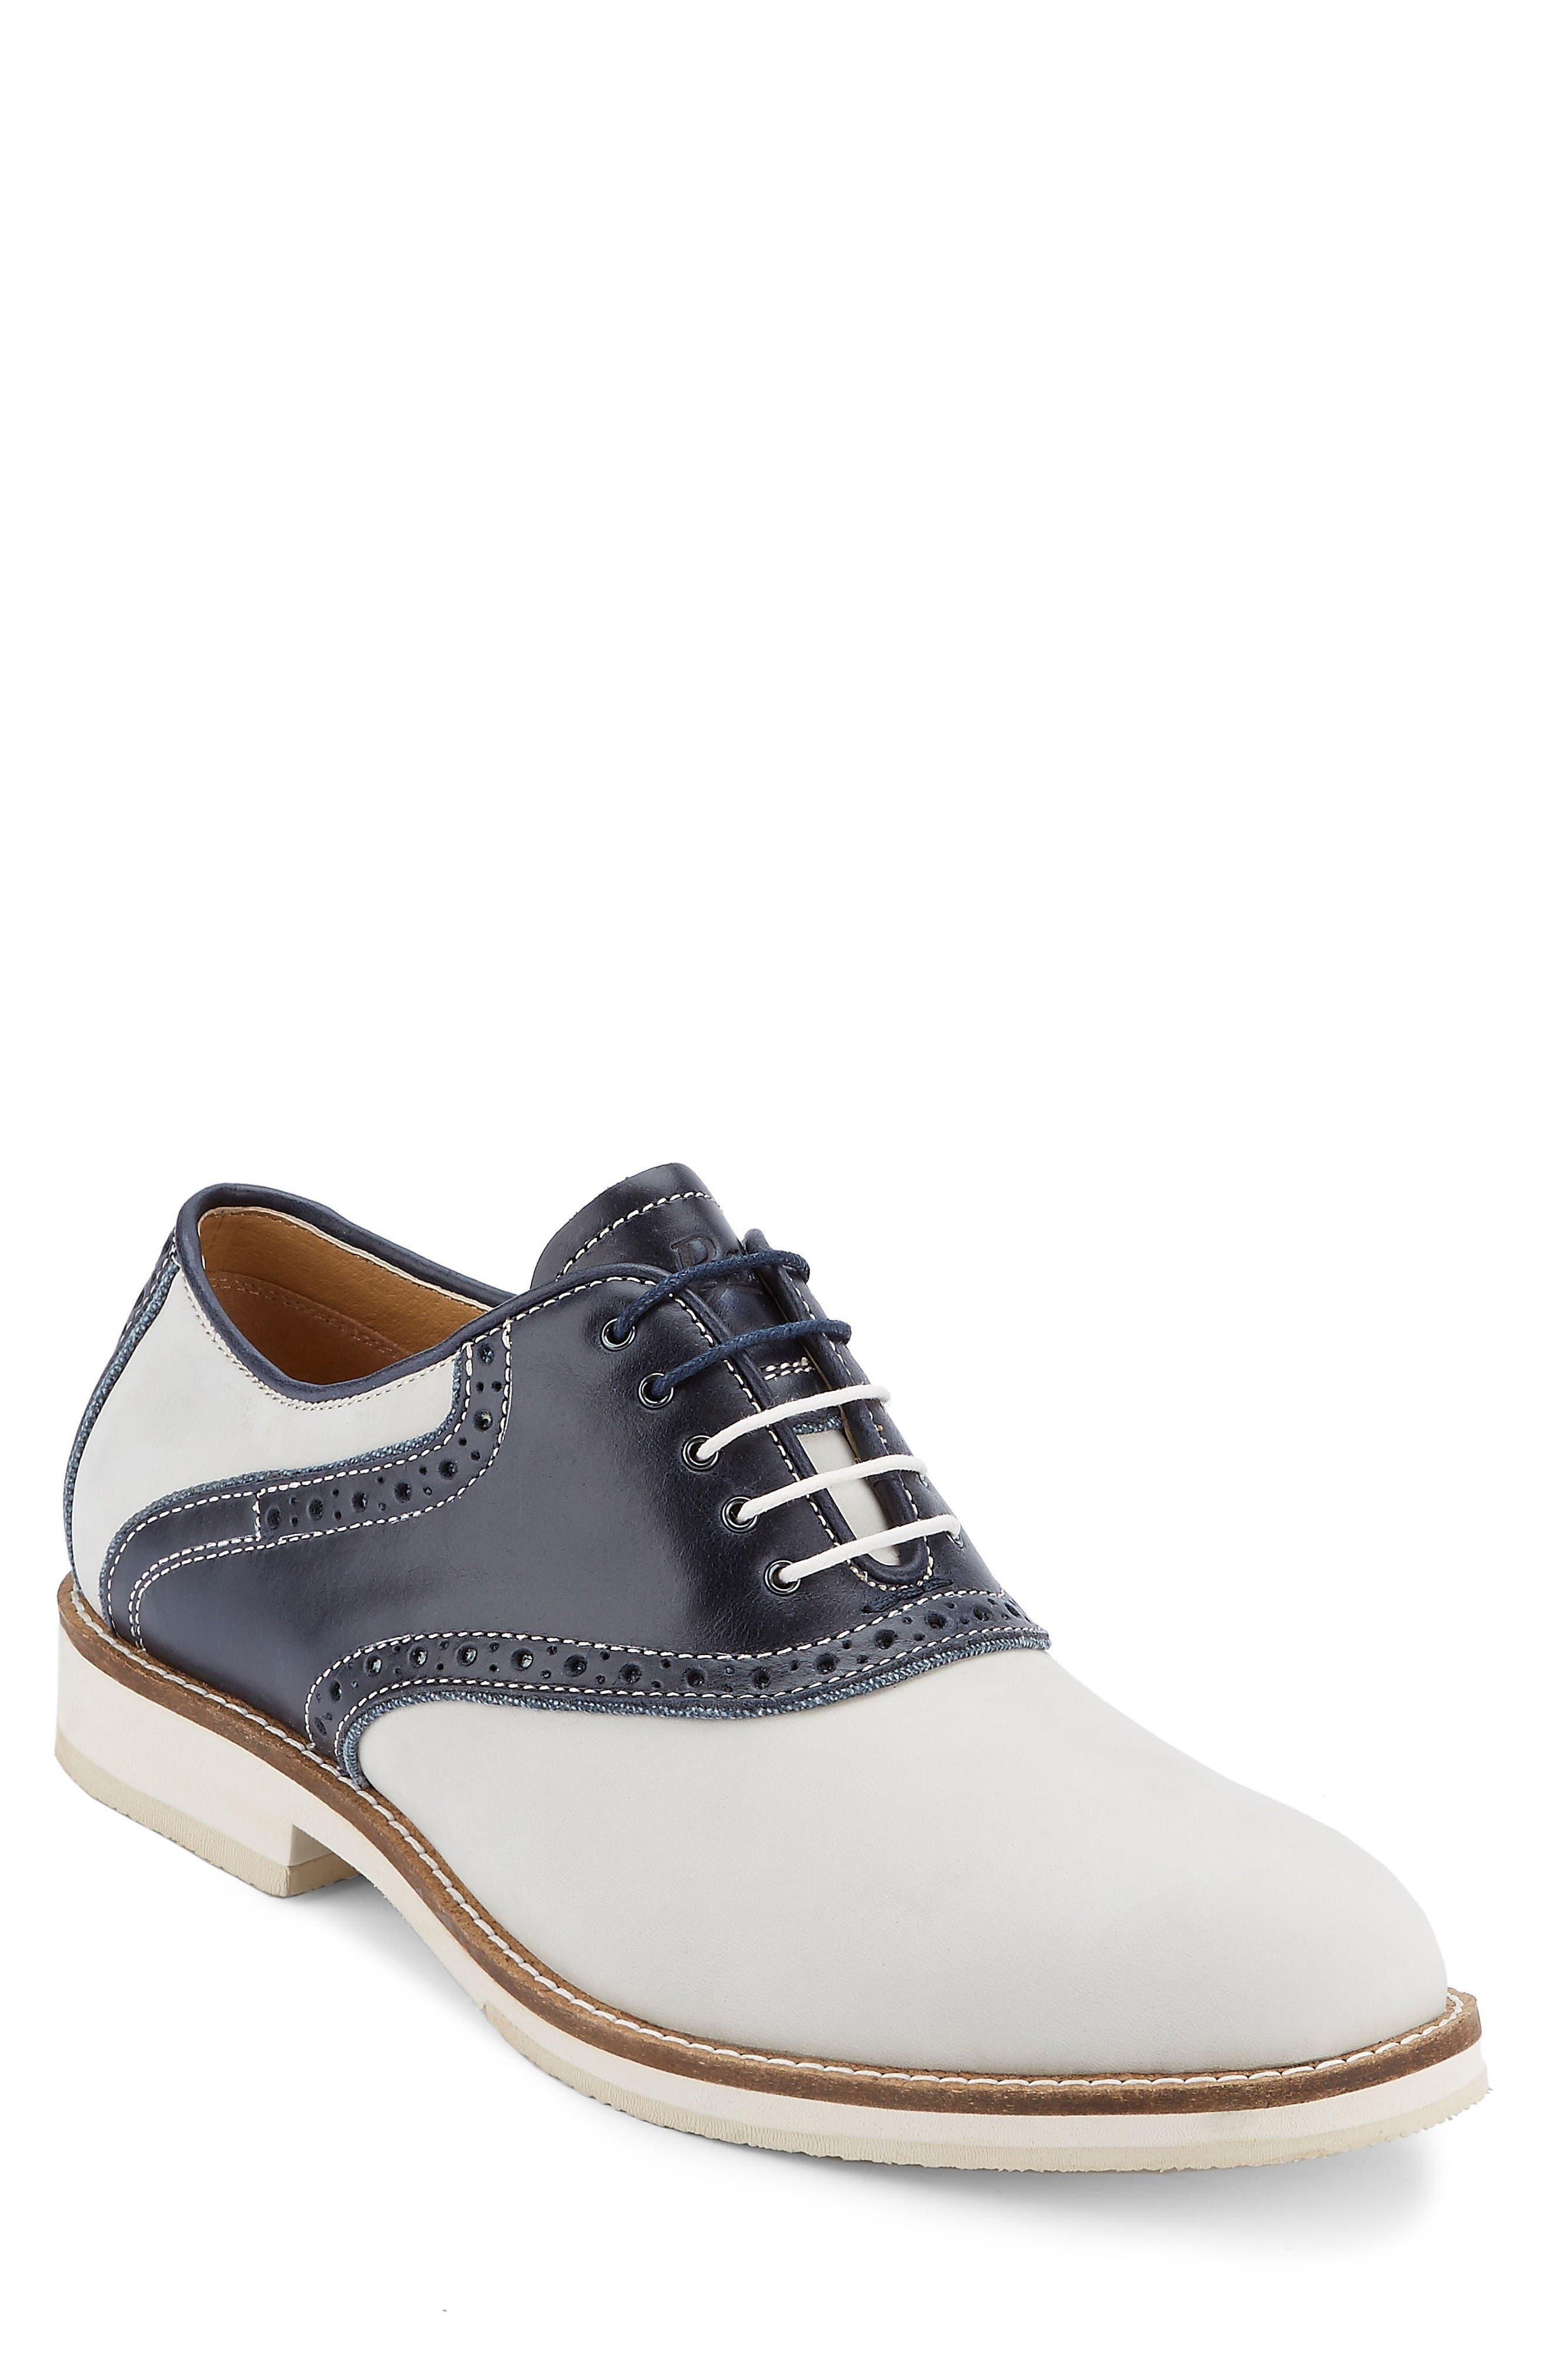 Noah Saddle Shoe,                         Main,                         color, Oyster/ Navy